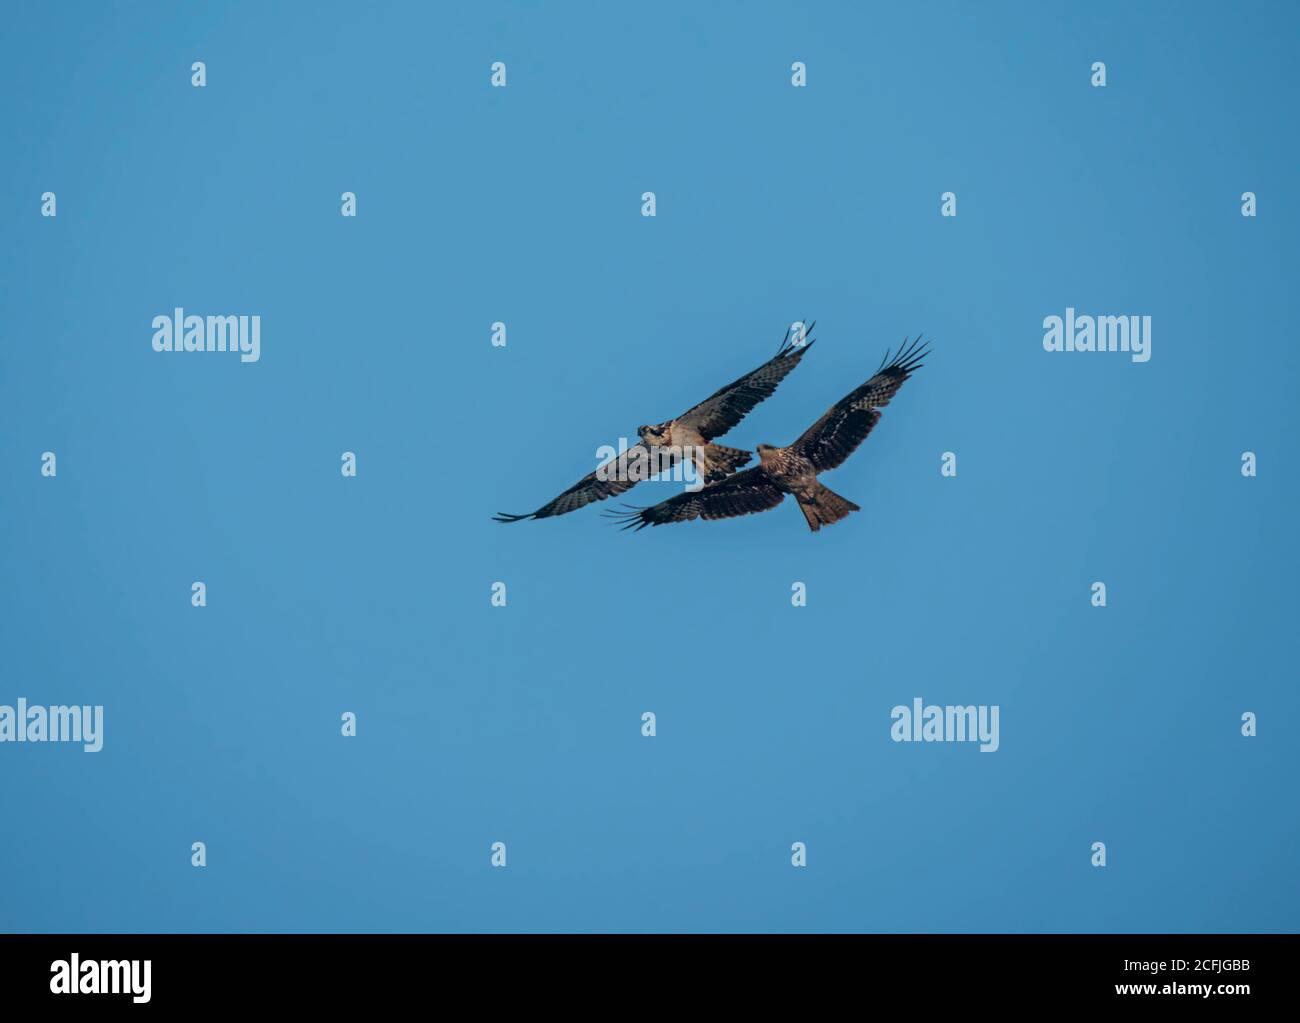 Raubvögel in der Tierwelt Pakistans Stockfoto